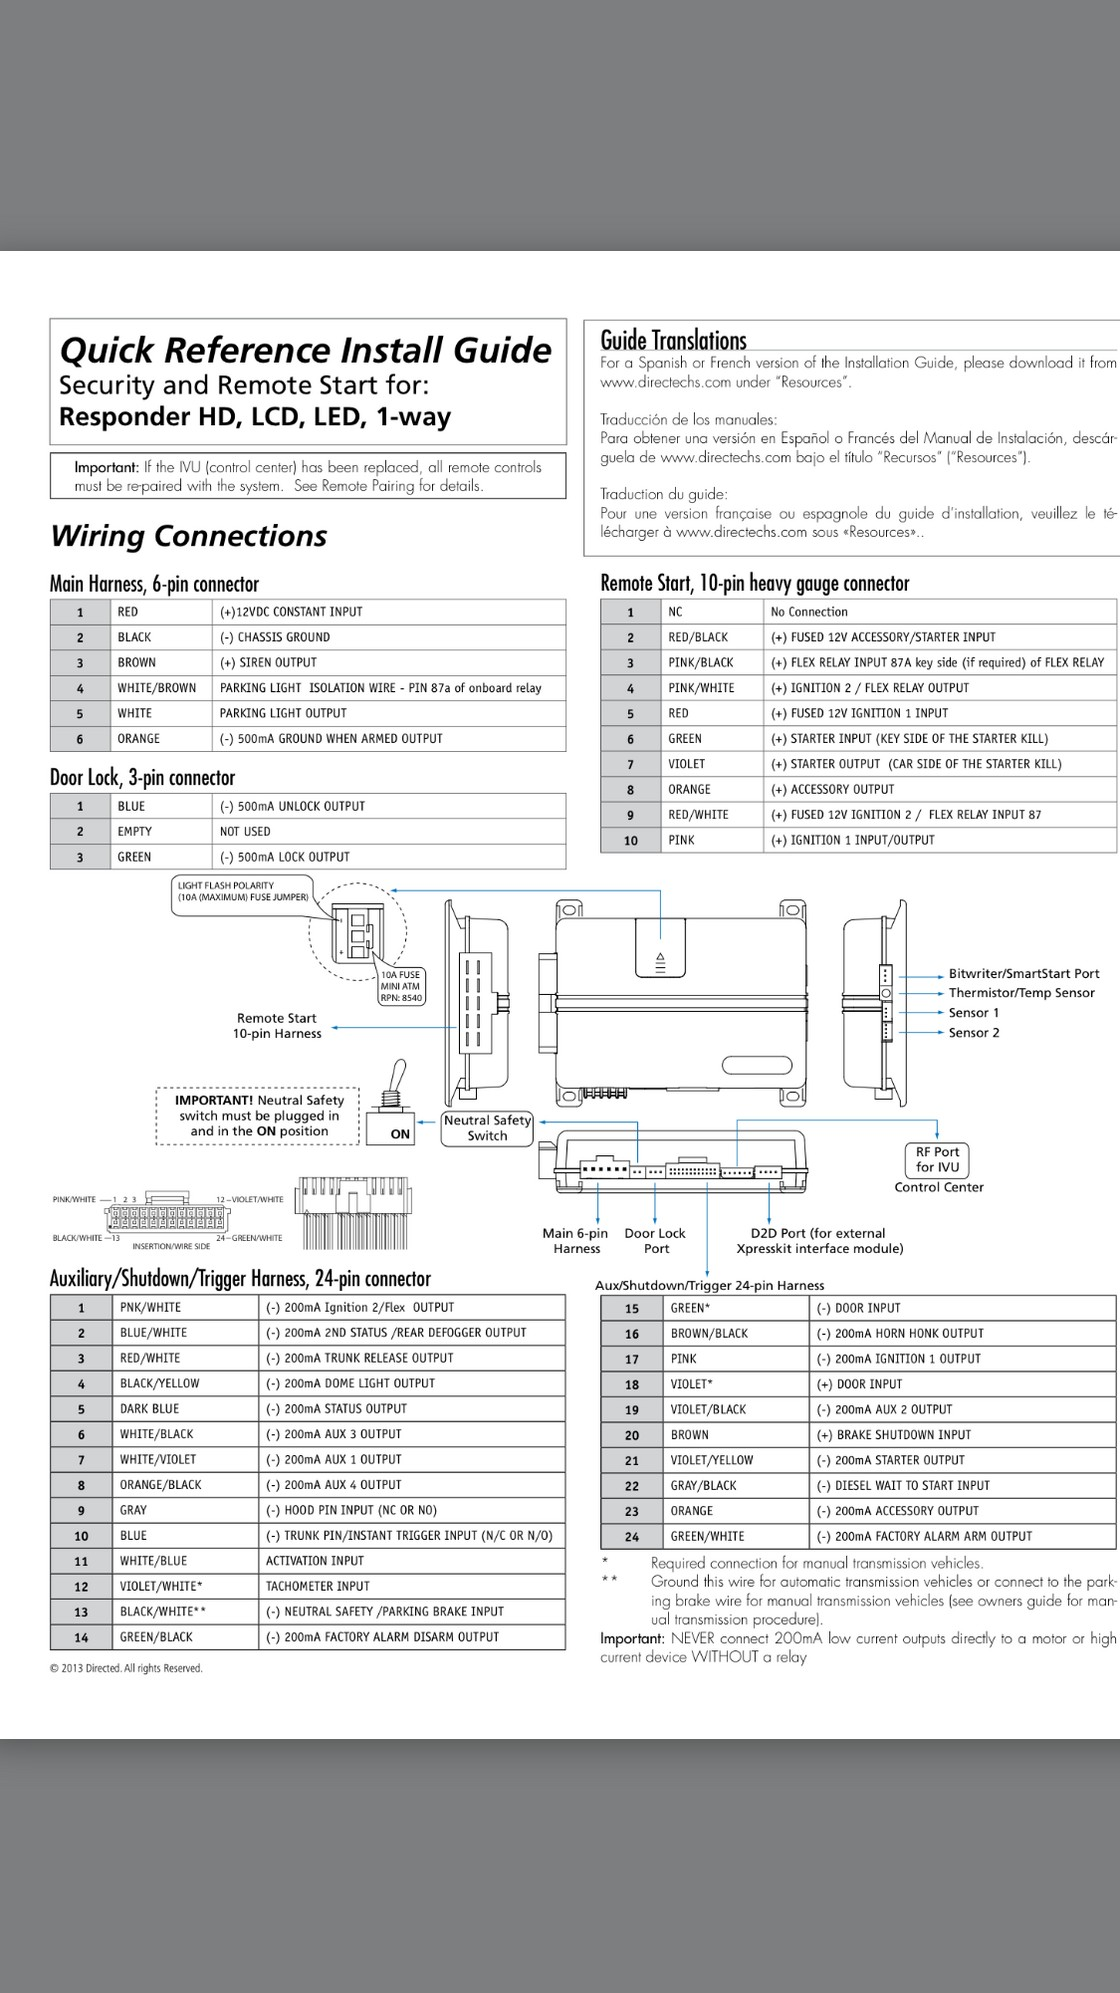 5706 Viper Alarm Wiring Diagram Viper 5706v Install Help Honda Tech Honda forum Discussion Of 5706 Viper Alarm Wiring Diagram